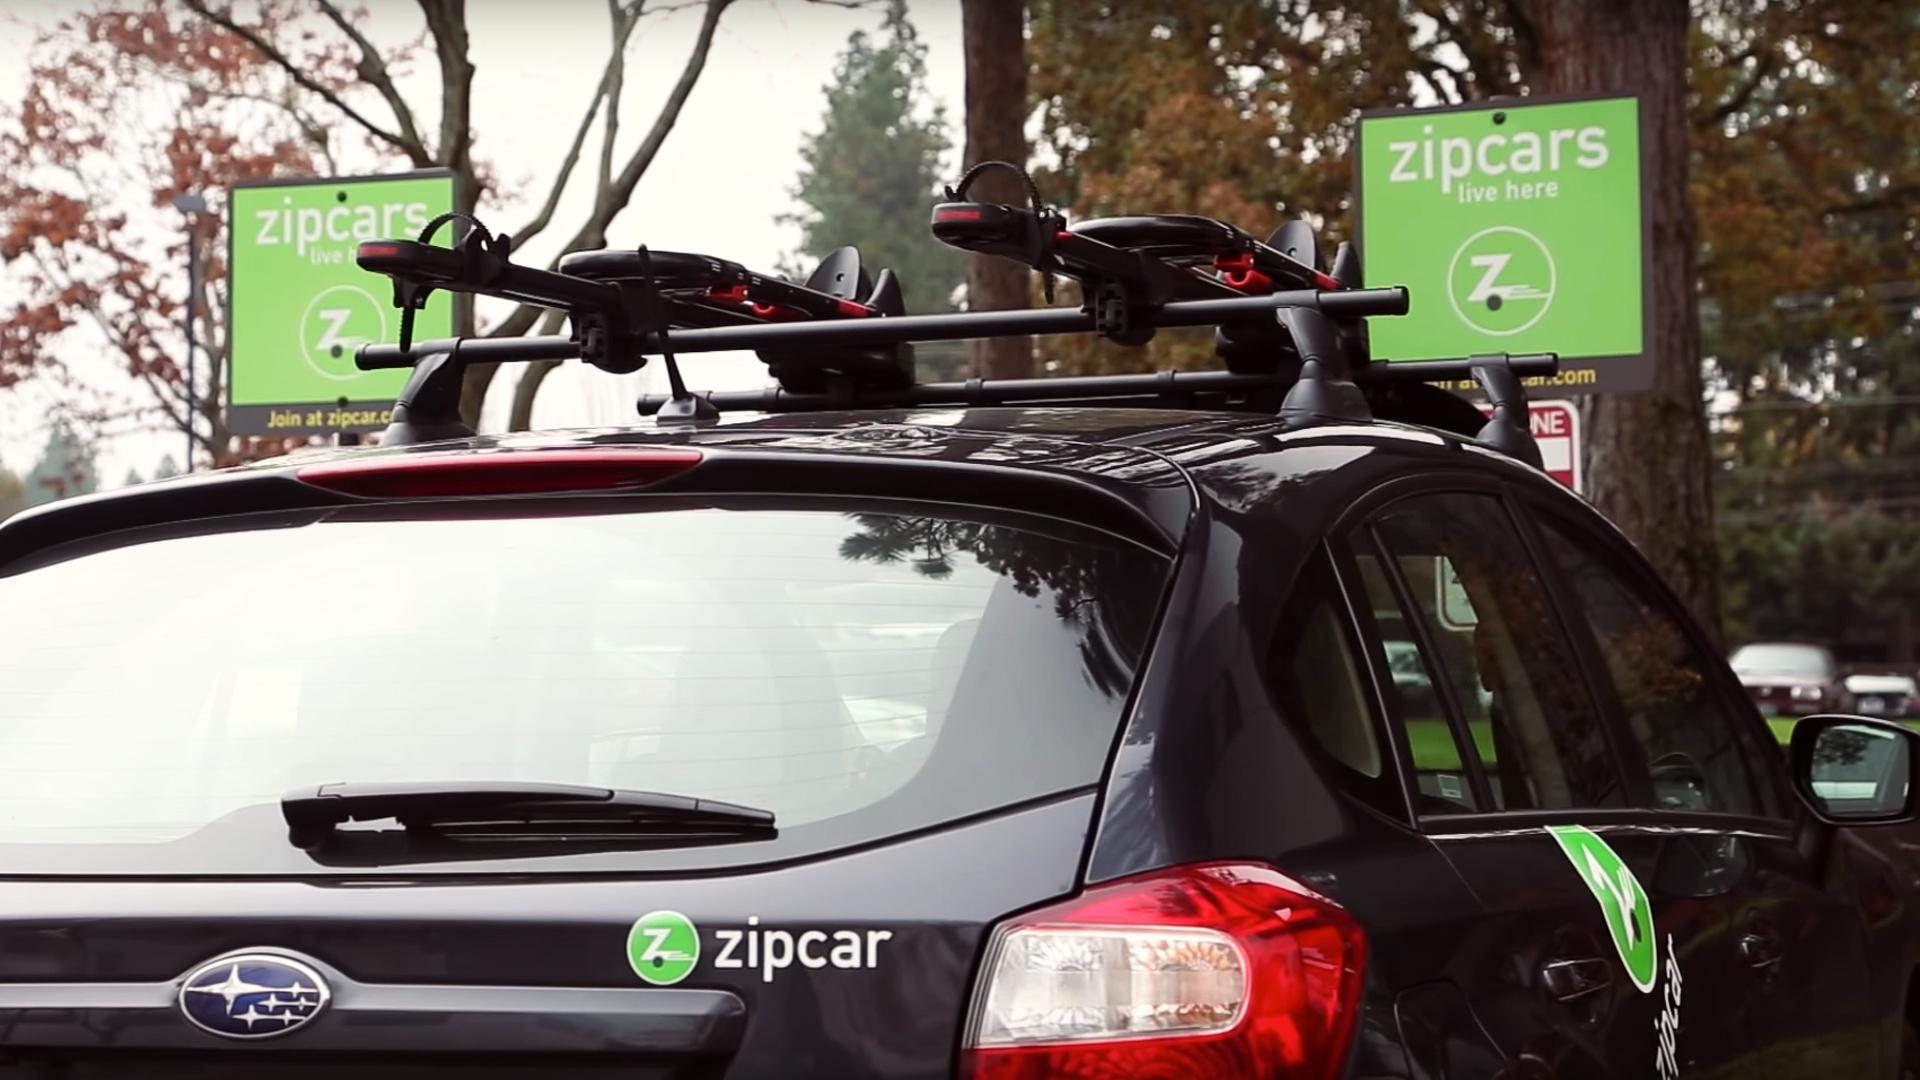 zipcar adds yakima roof racks for bikes